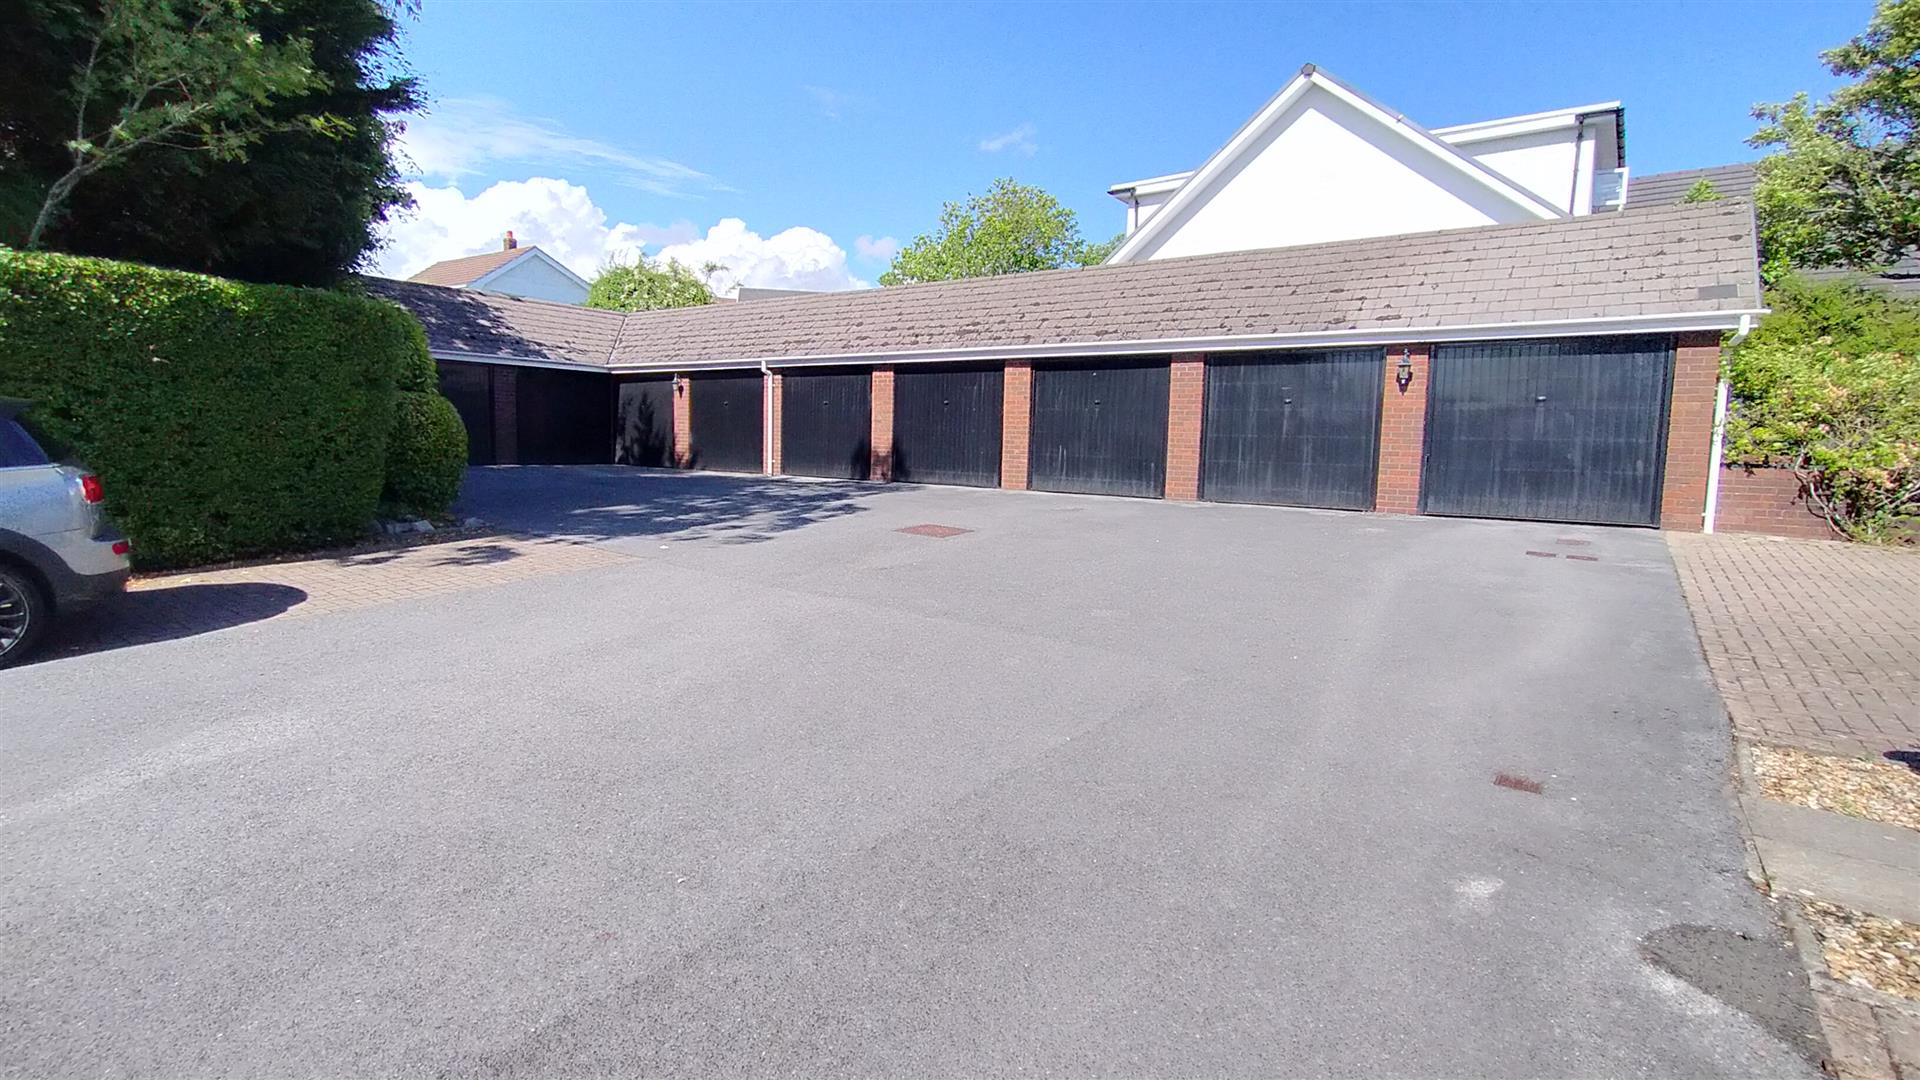 Victoria Court, Caswell Drive, Caswell, Swansea, SA3 4RW